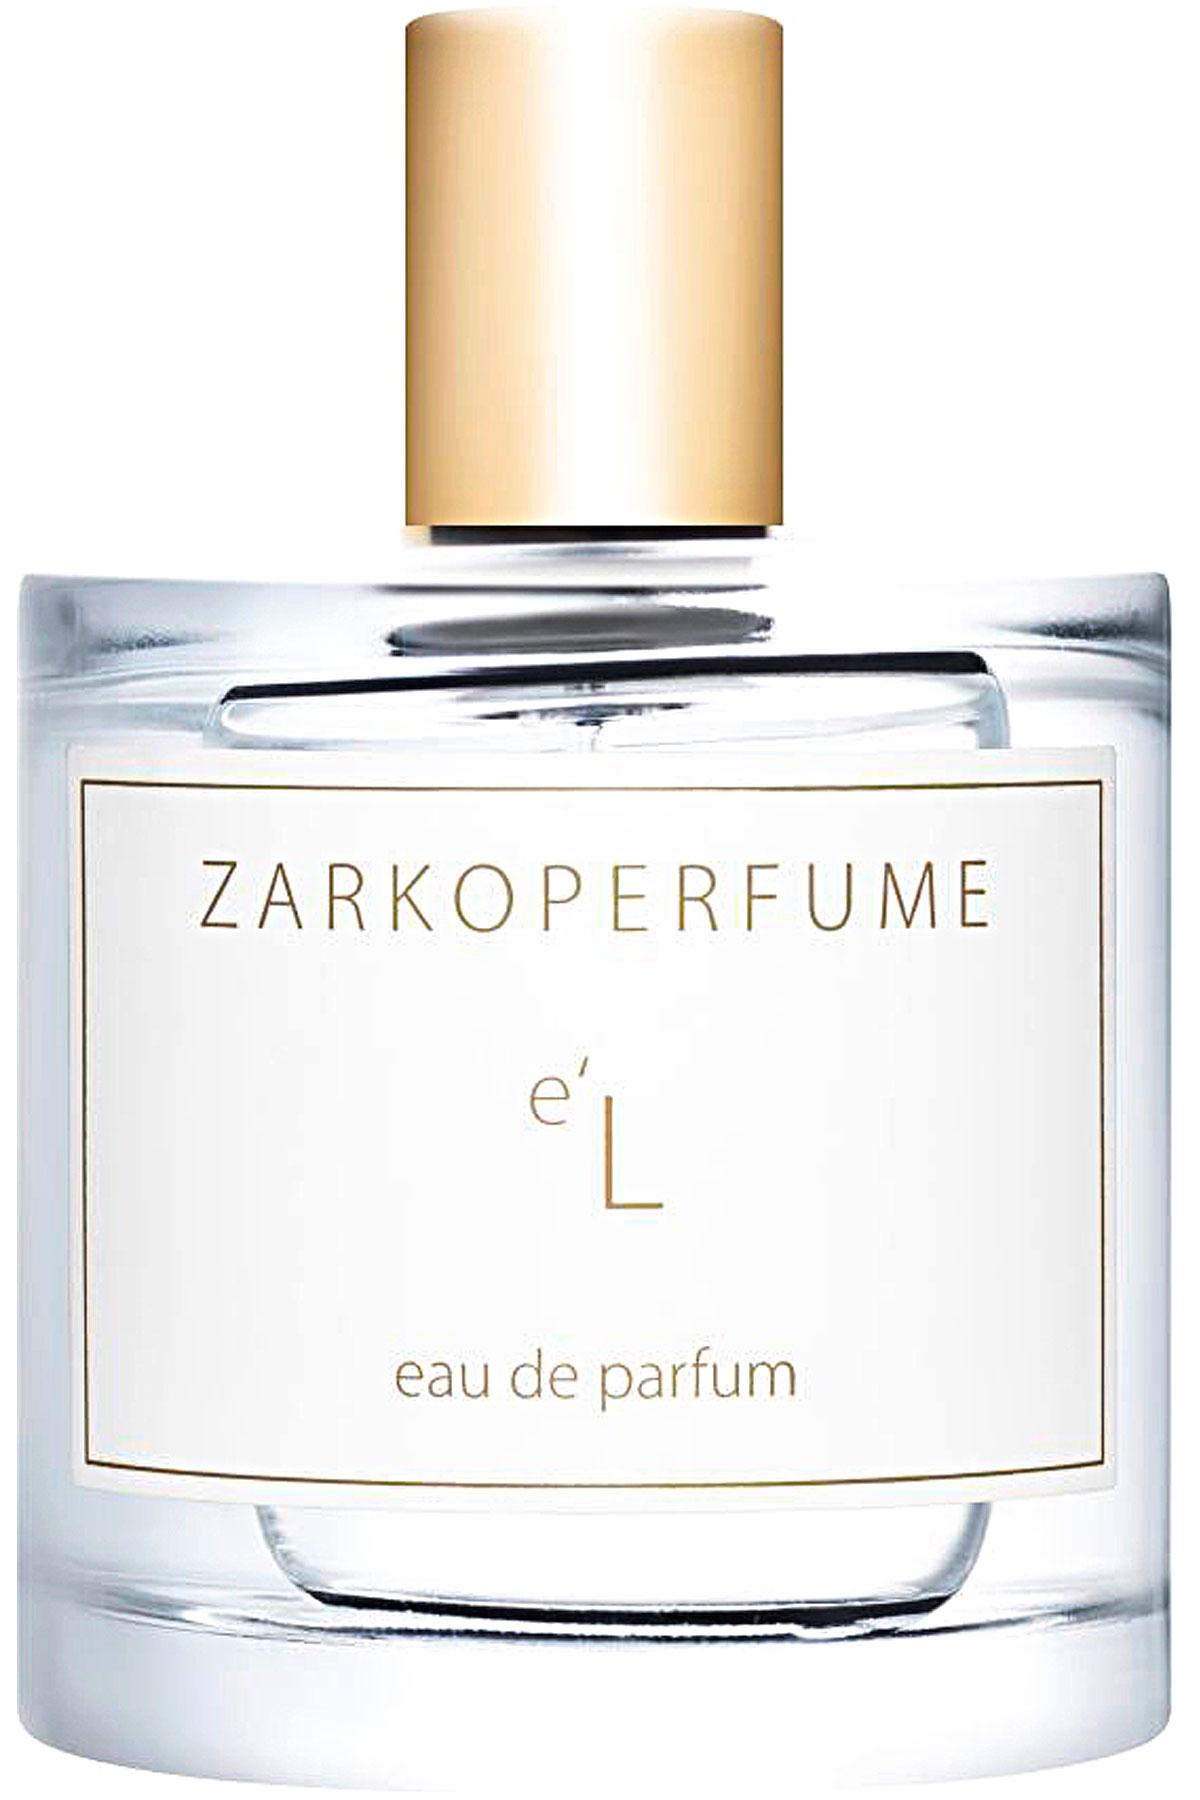 Zarkoperfume Fragrances for Women, E L - Eau De Parfum - 100 Ml, 2019, 100 ml